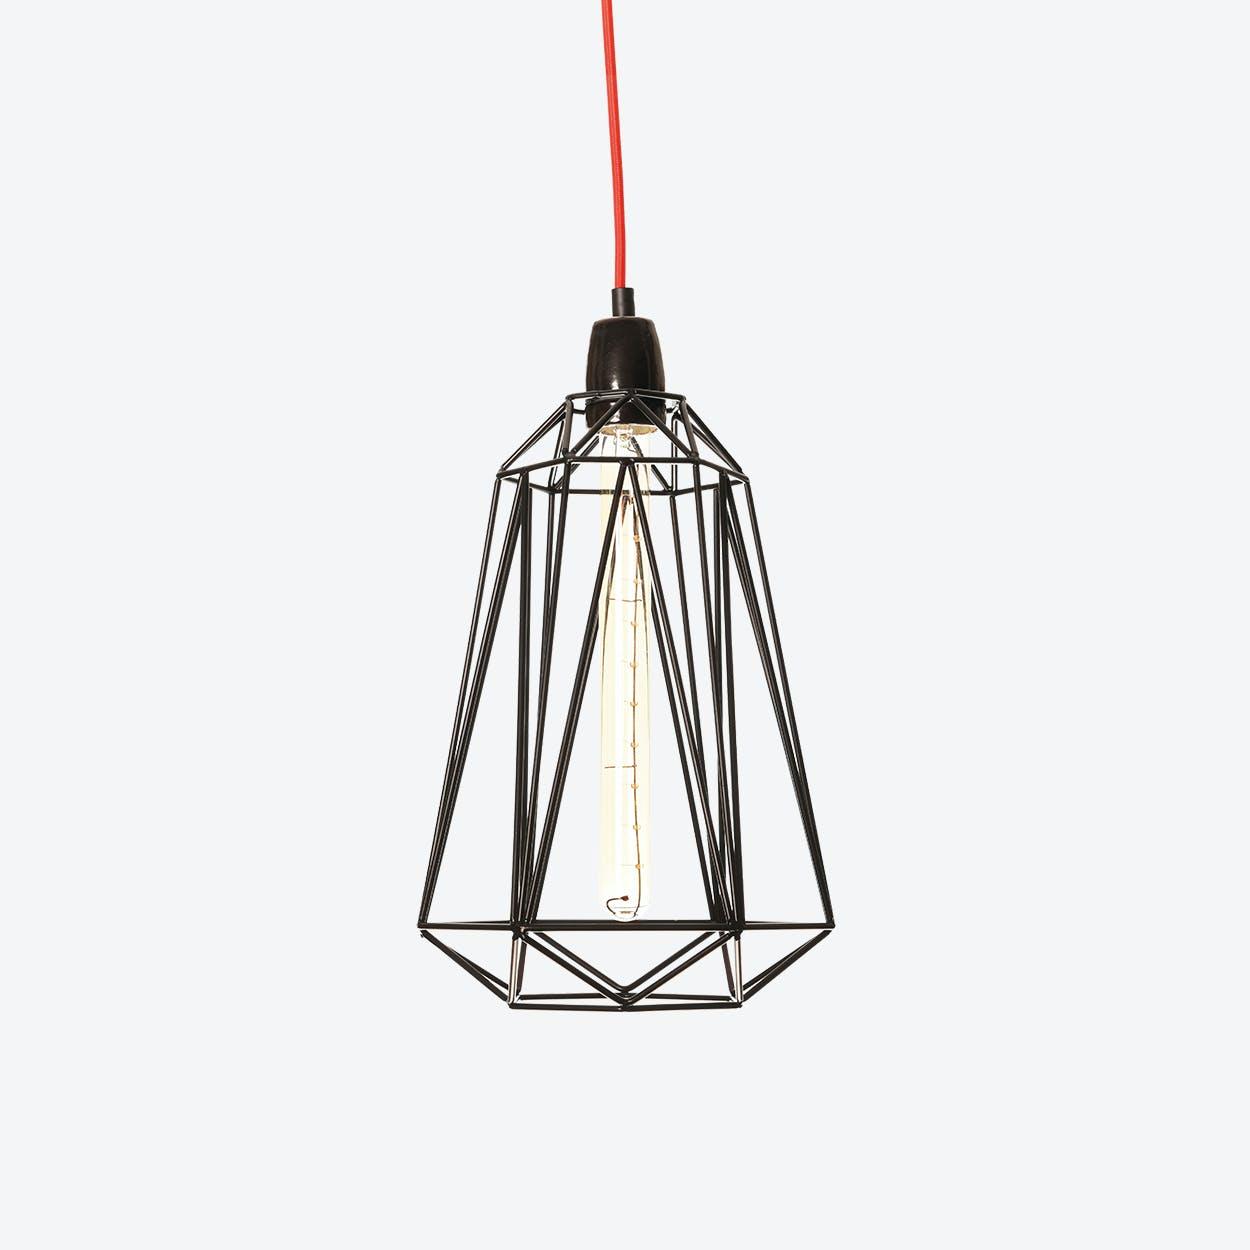 Industrial Pendant Light Medium Diamond in Black with Red Cord